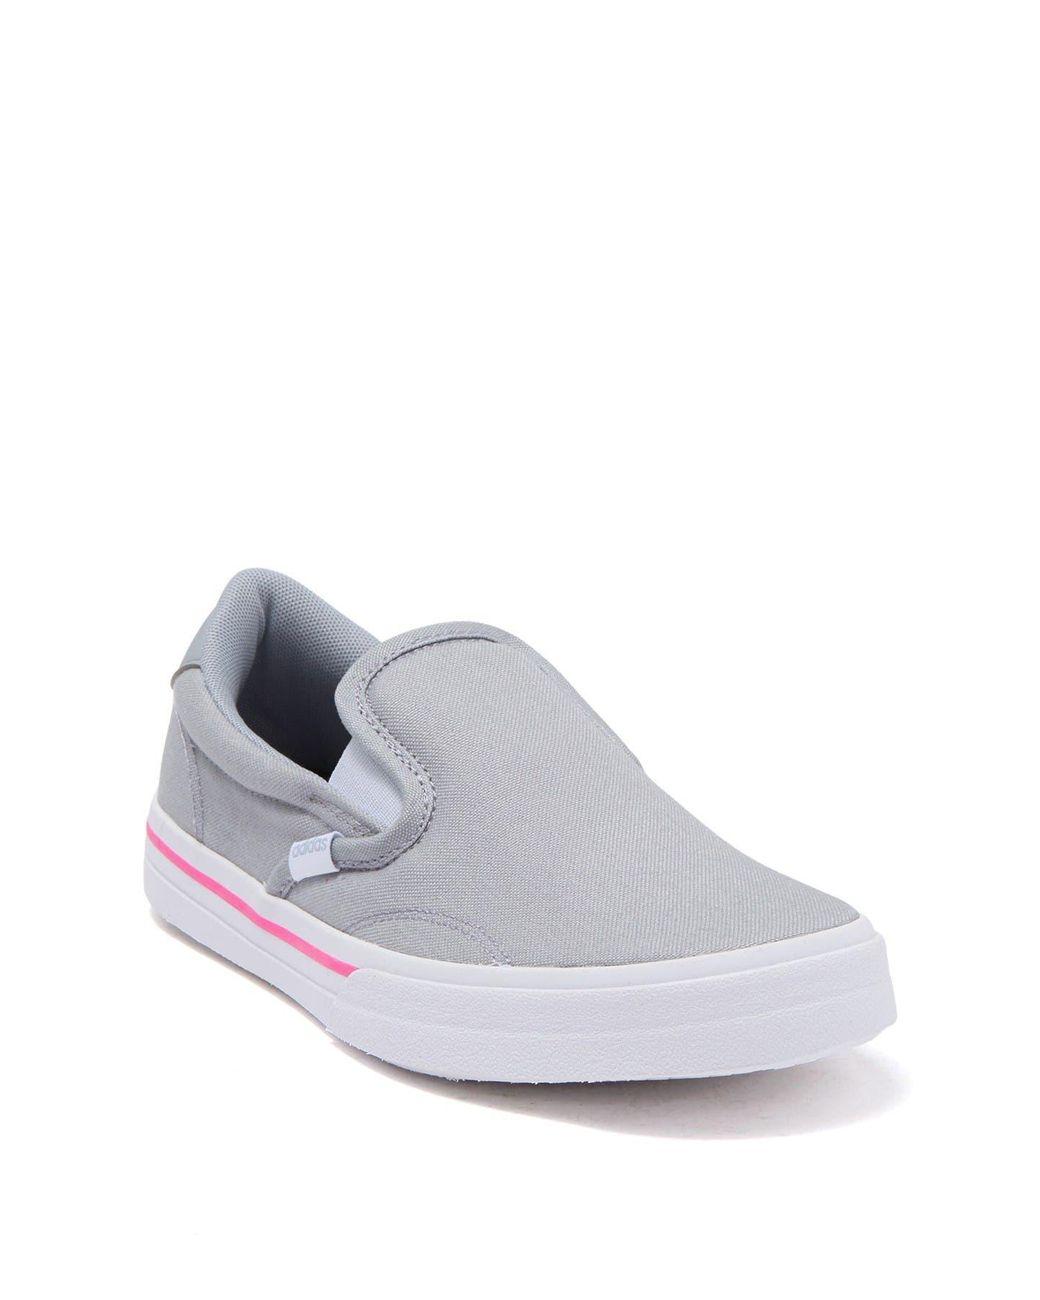 adidas Kurin Sneaker - Lyst